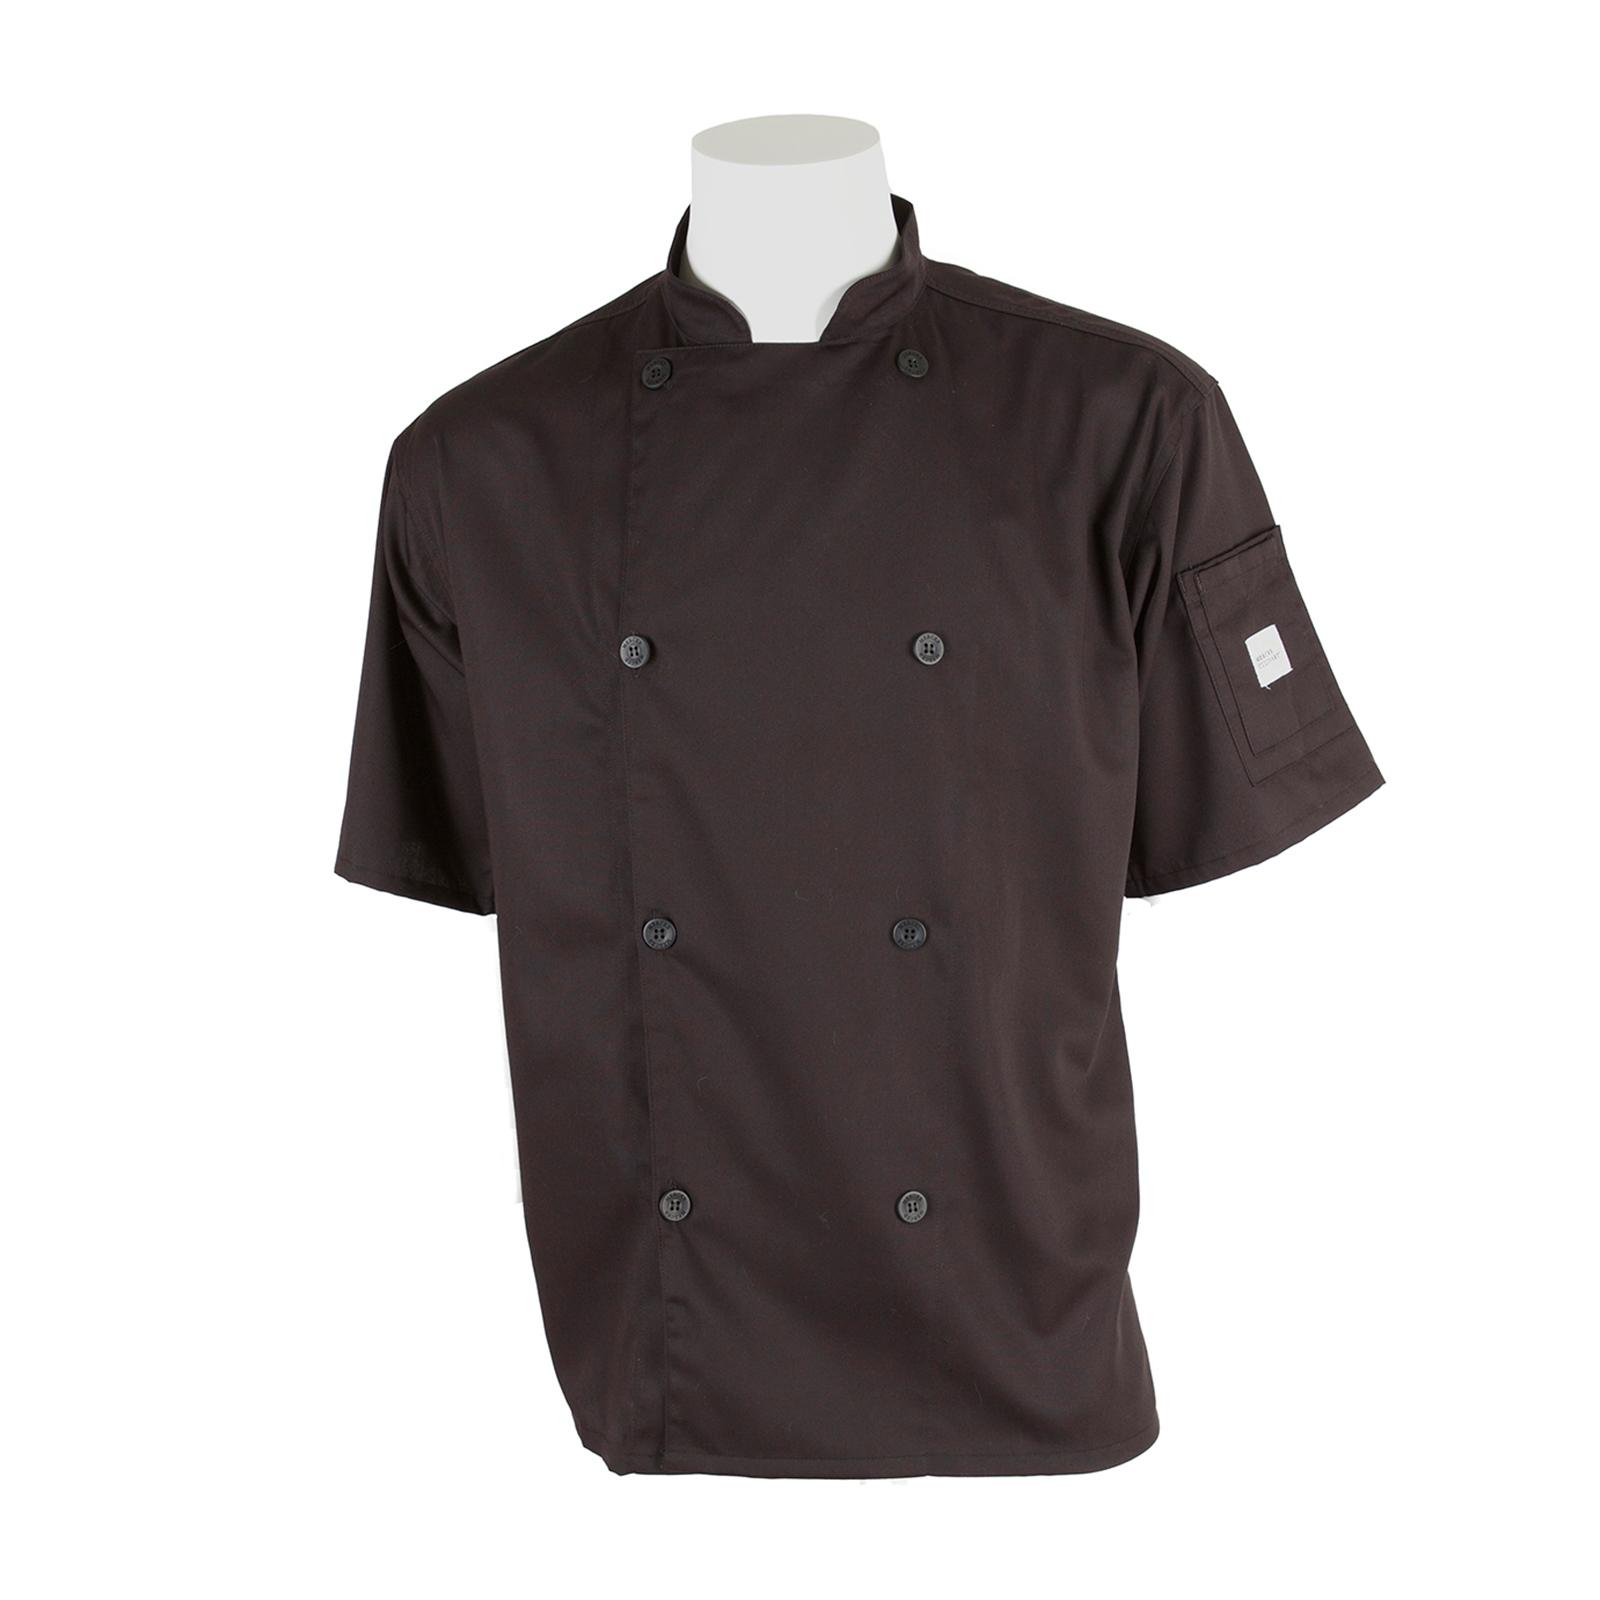 Mercer Culinary M61012BK3X chef's coat